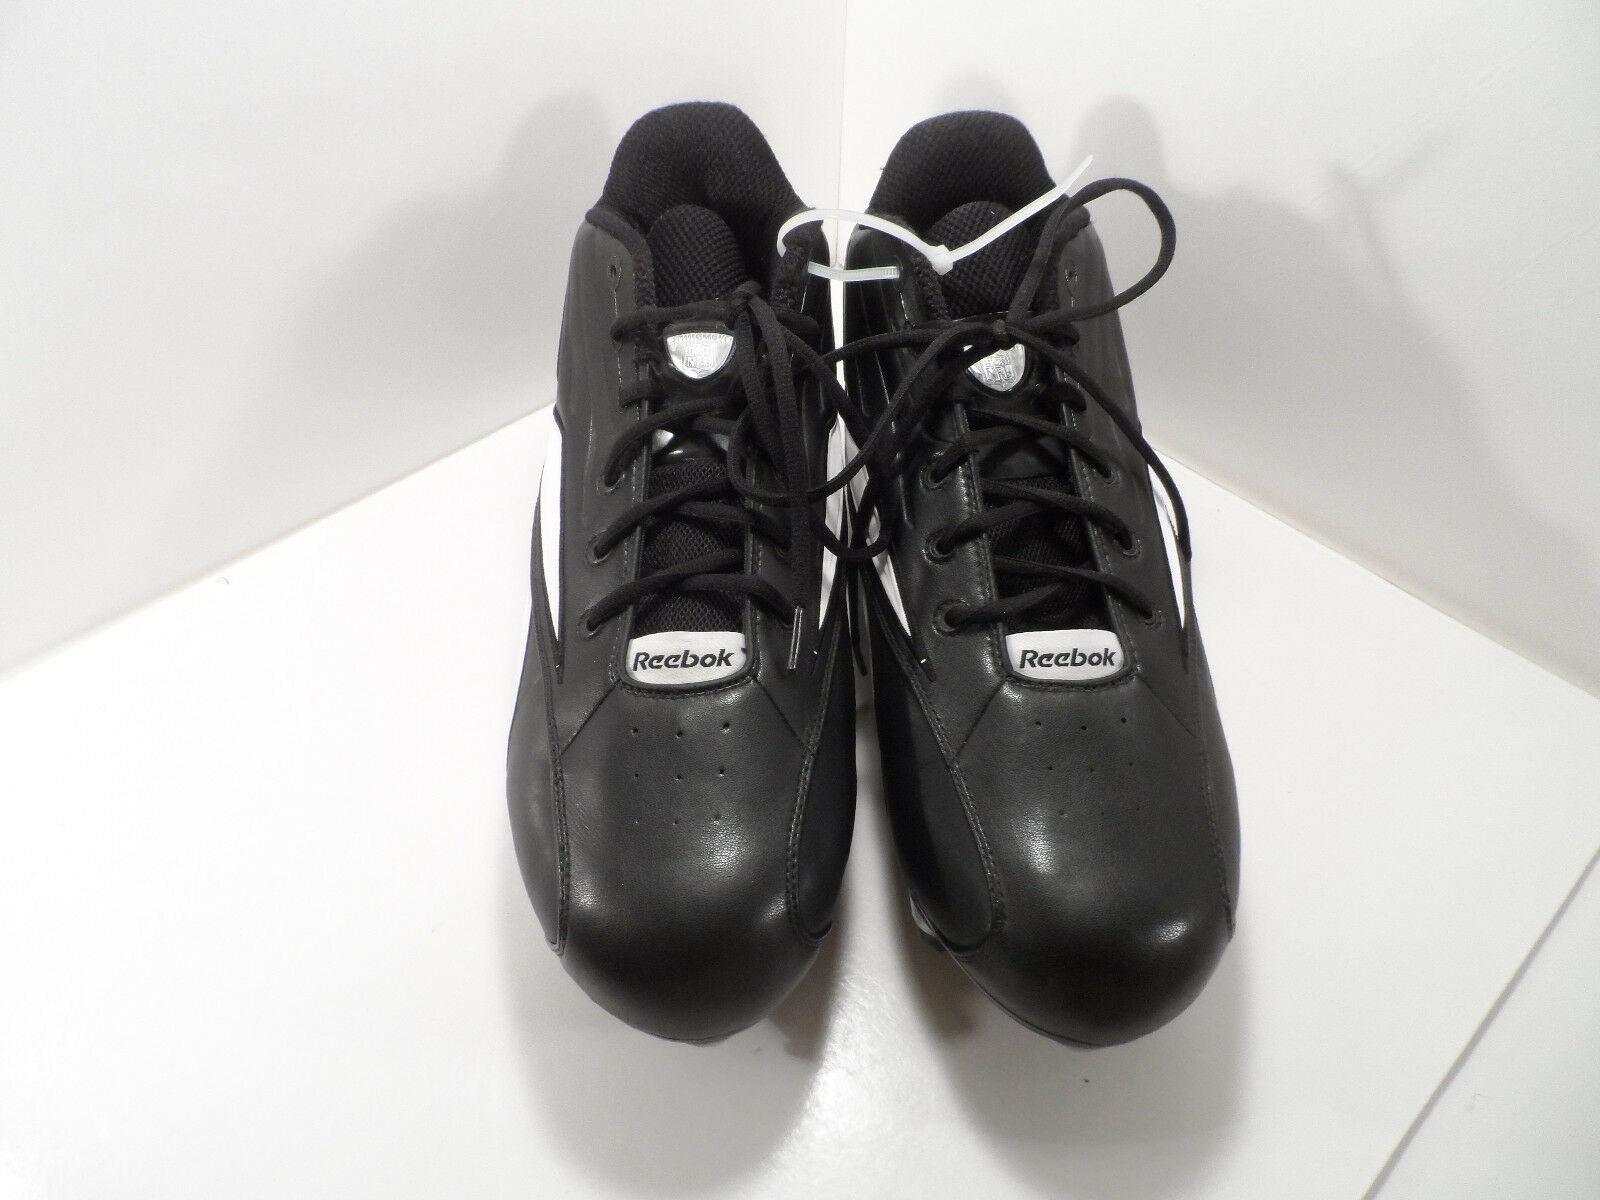 Reebok Men's Size Black /White Equipment NFL Tennis Shoes - Size Men's 18 - VGC bf2a10